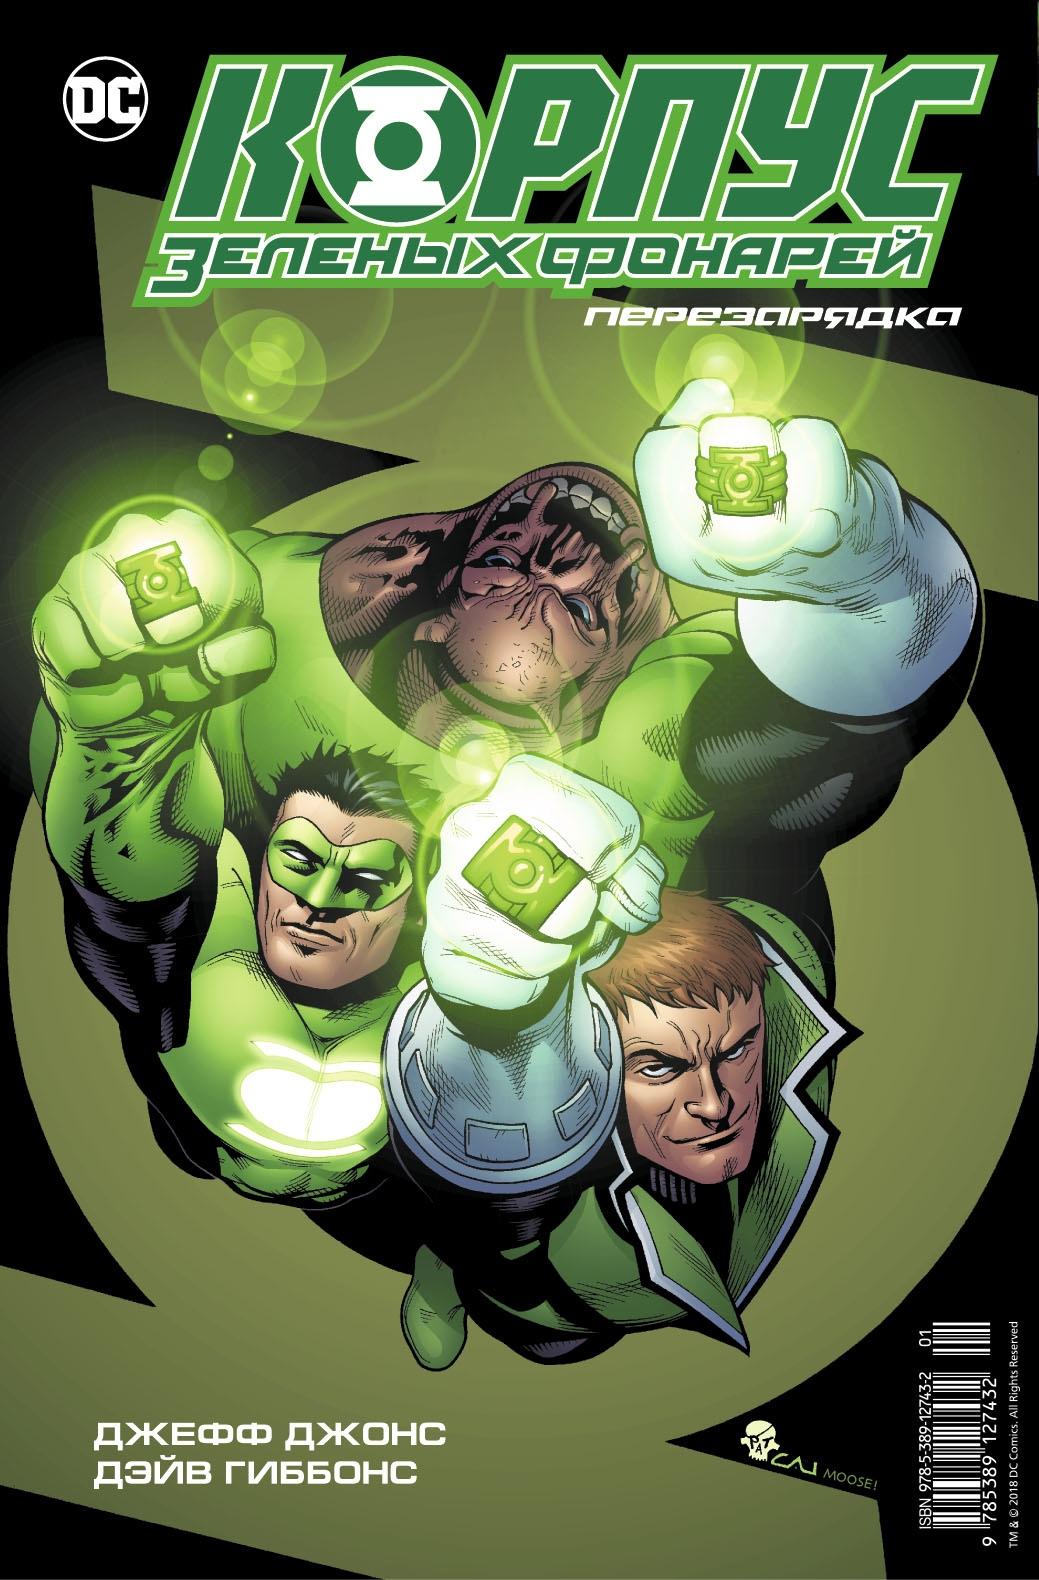 Комикс «Корпус Зеленых Фонарей. Перезарядка» (2006)